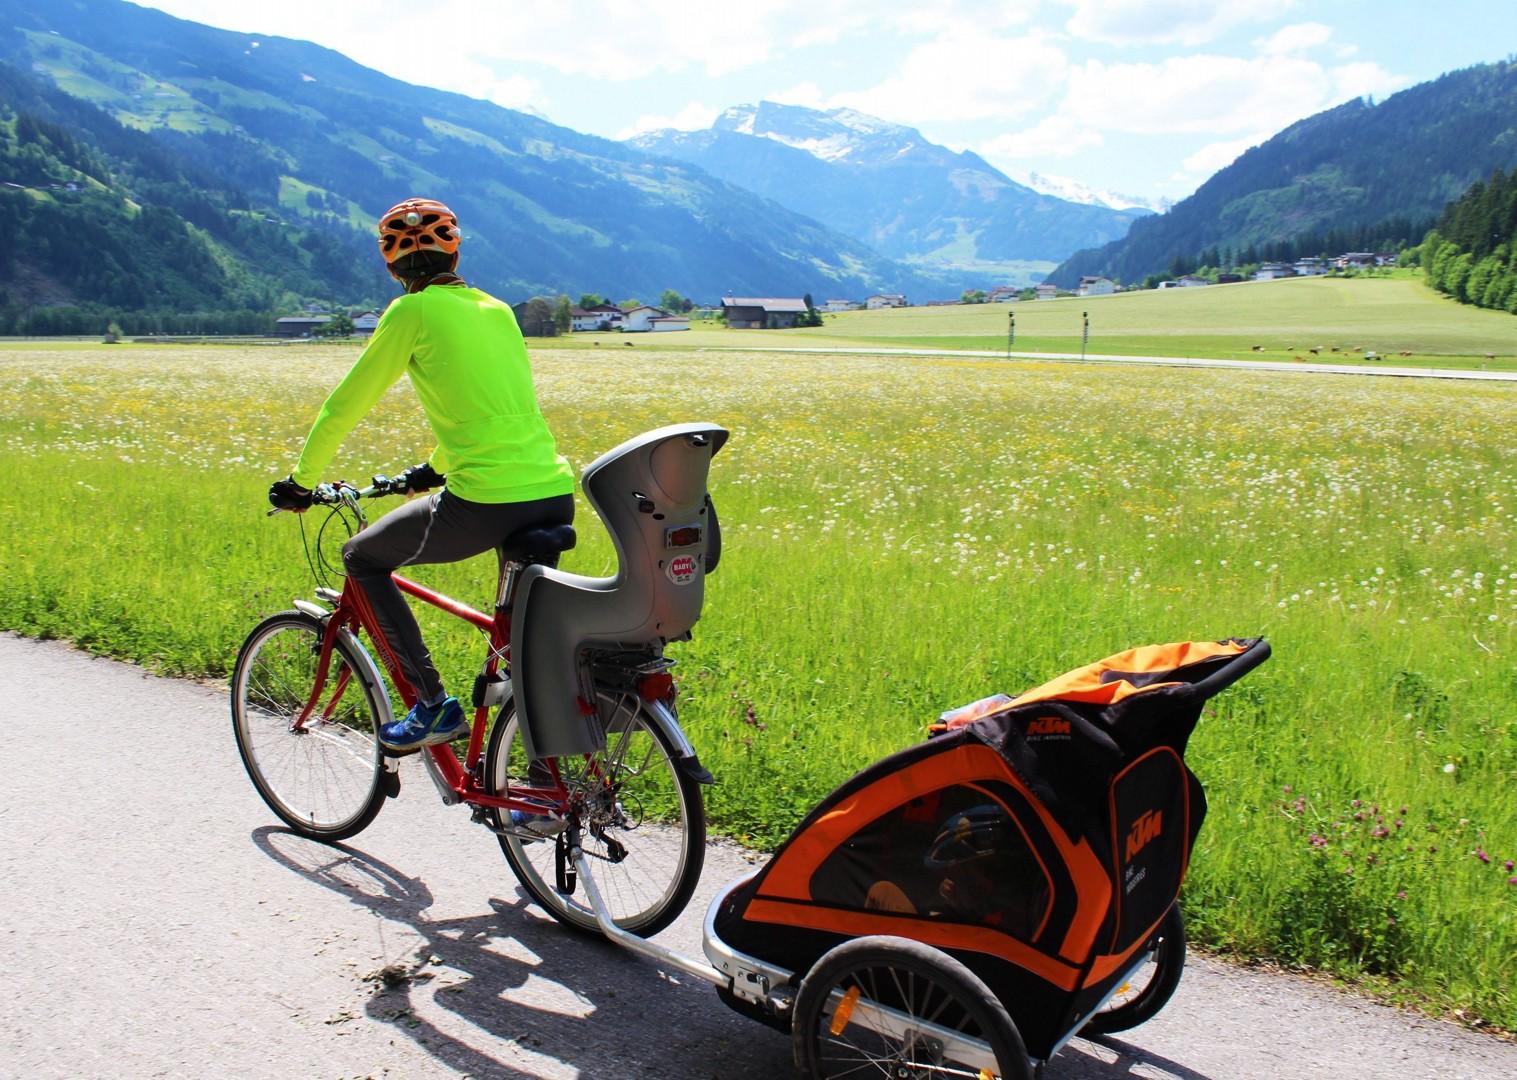 _Holiday.548.18328.jpg - Austria - Tauern Valleys - Self-Guided Family Cycling Holiday - Family Cycling